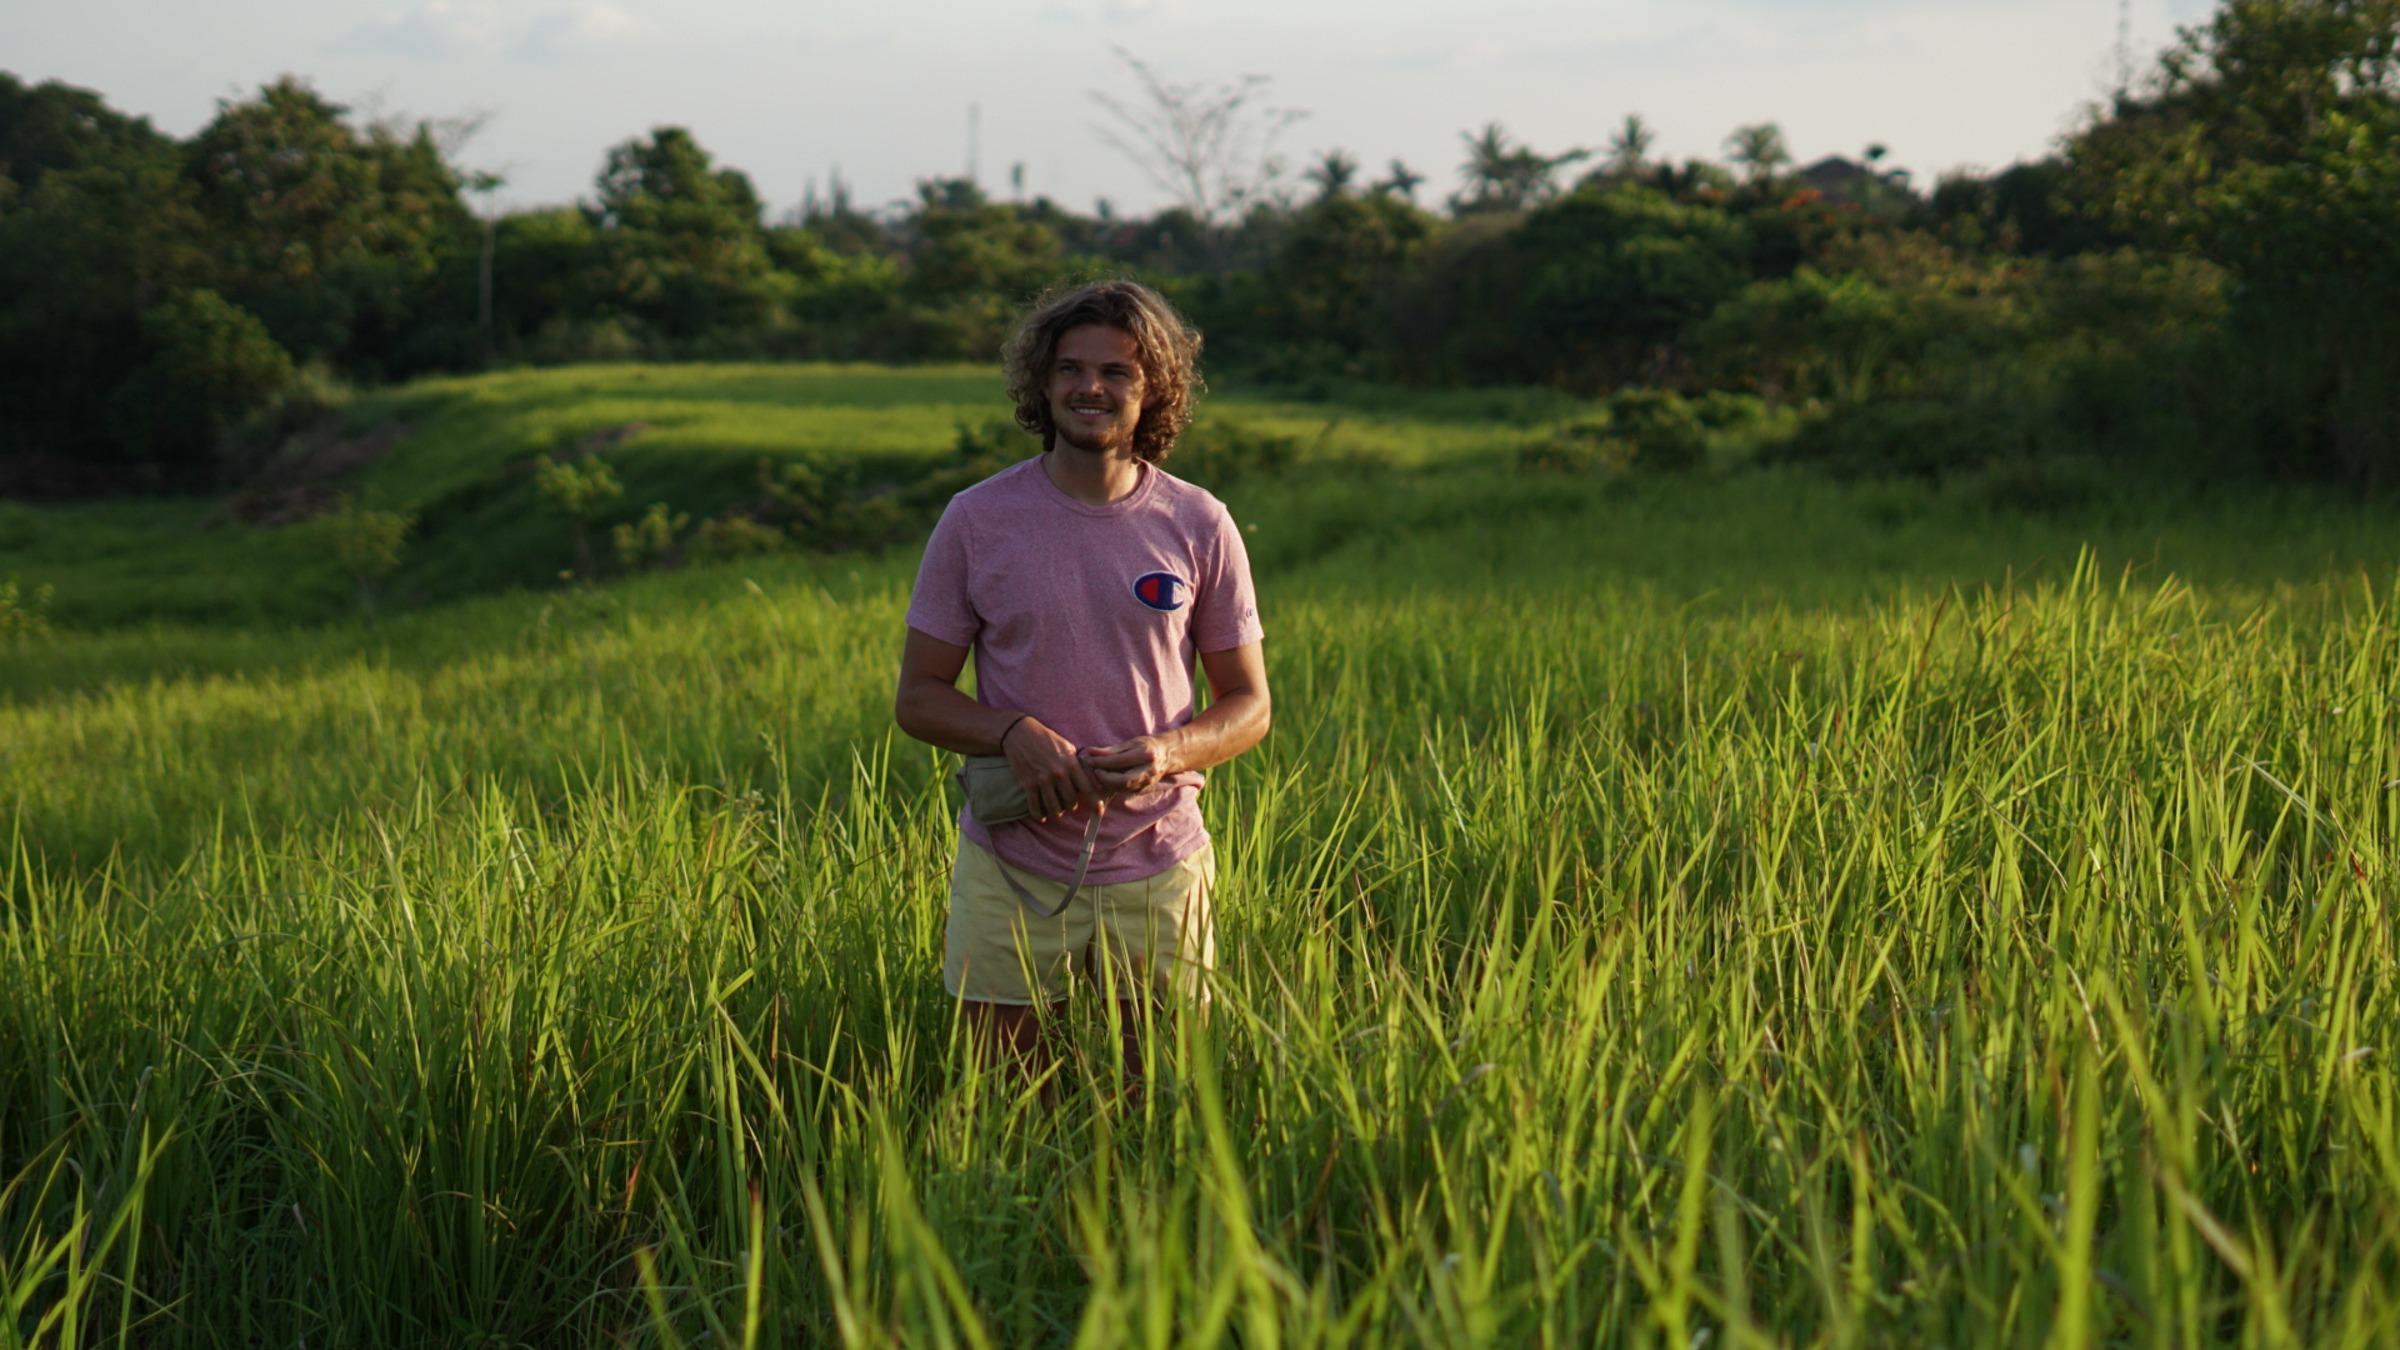 Verdwaalde jongen in zonnig grasveld